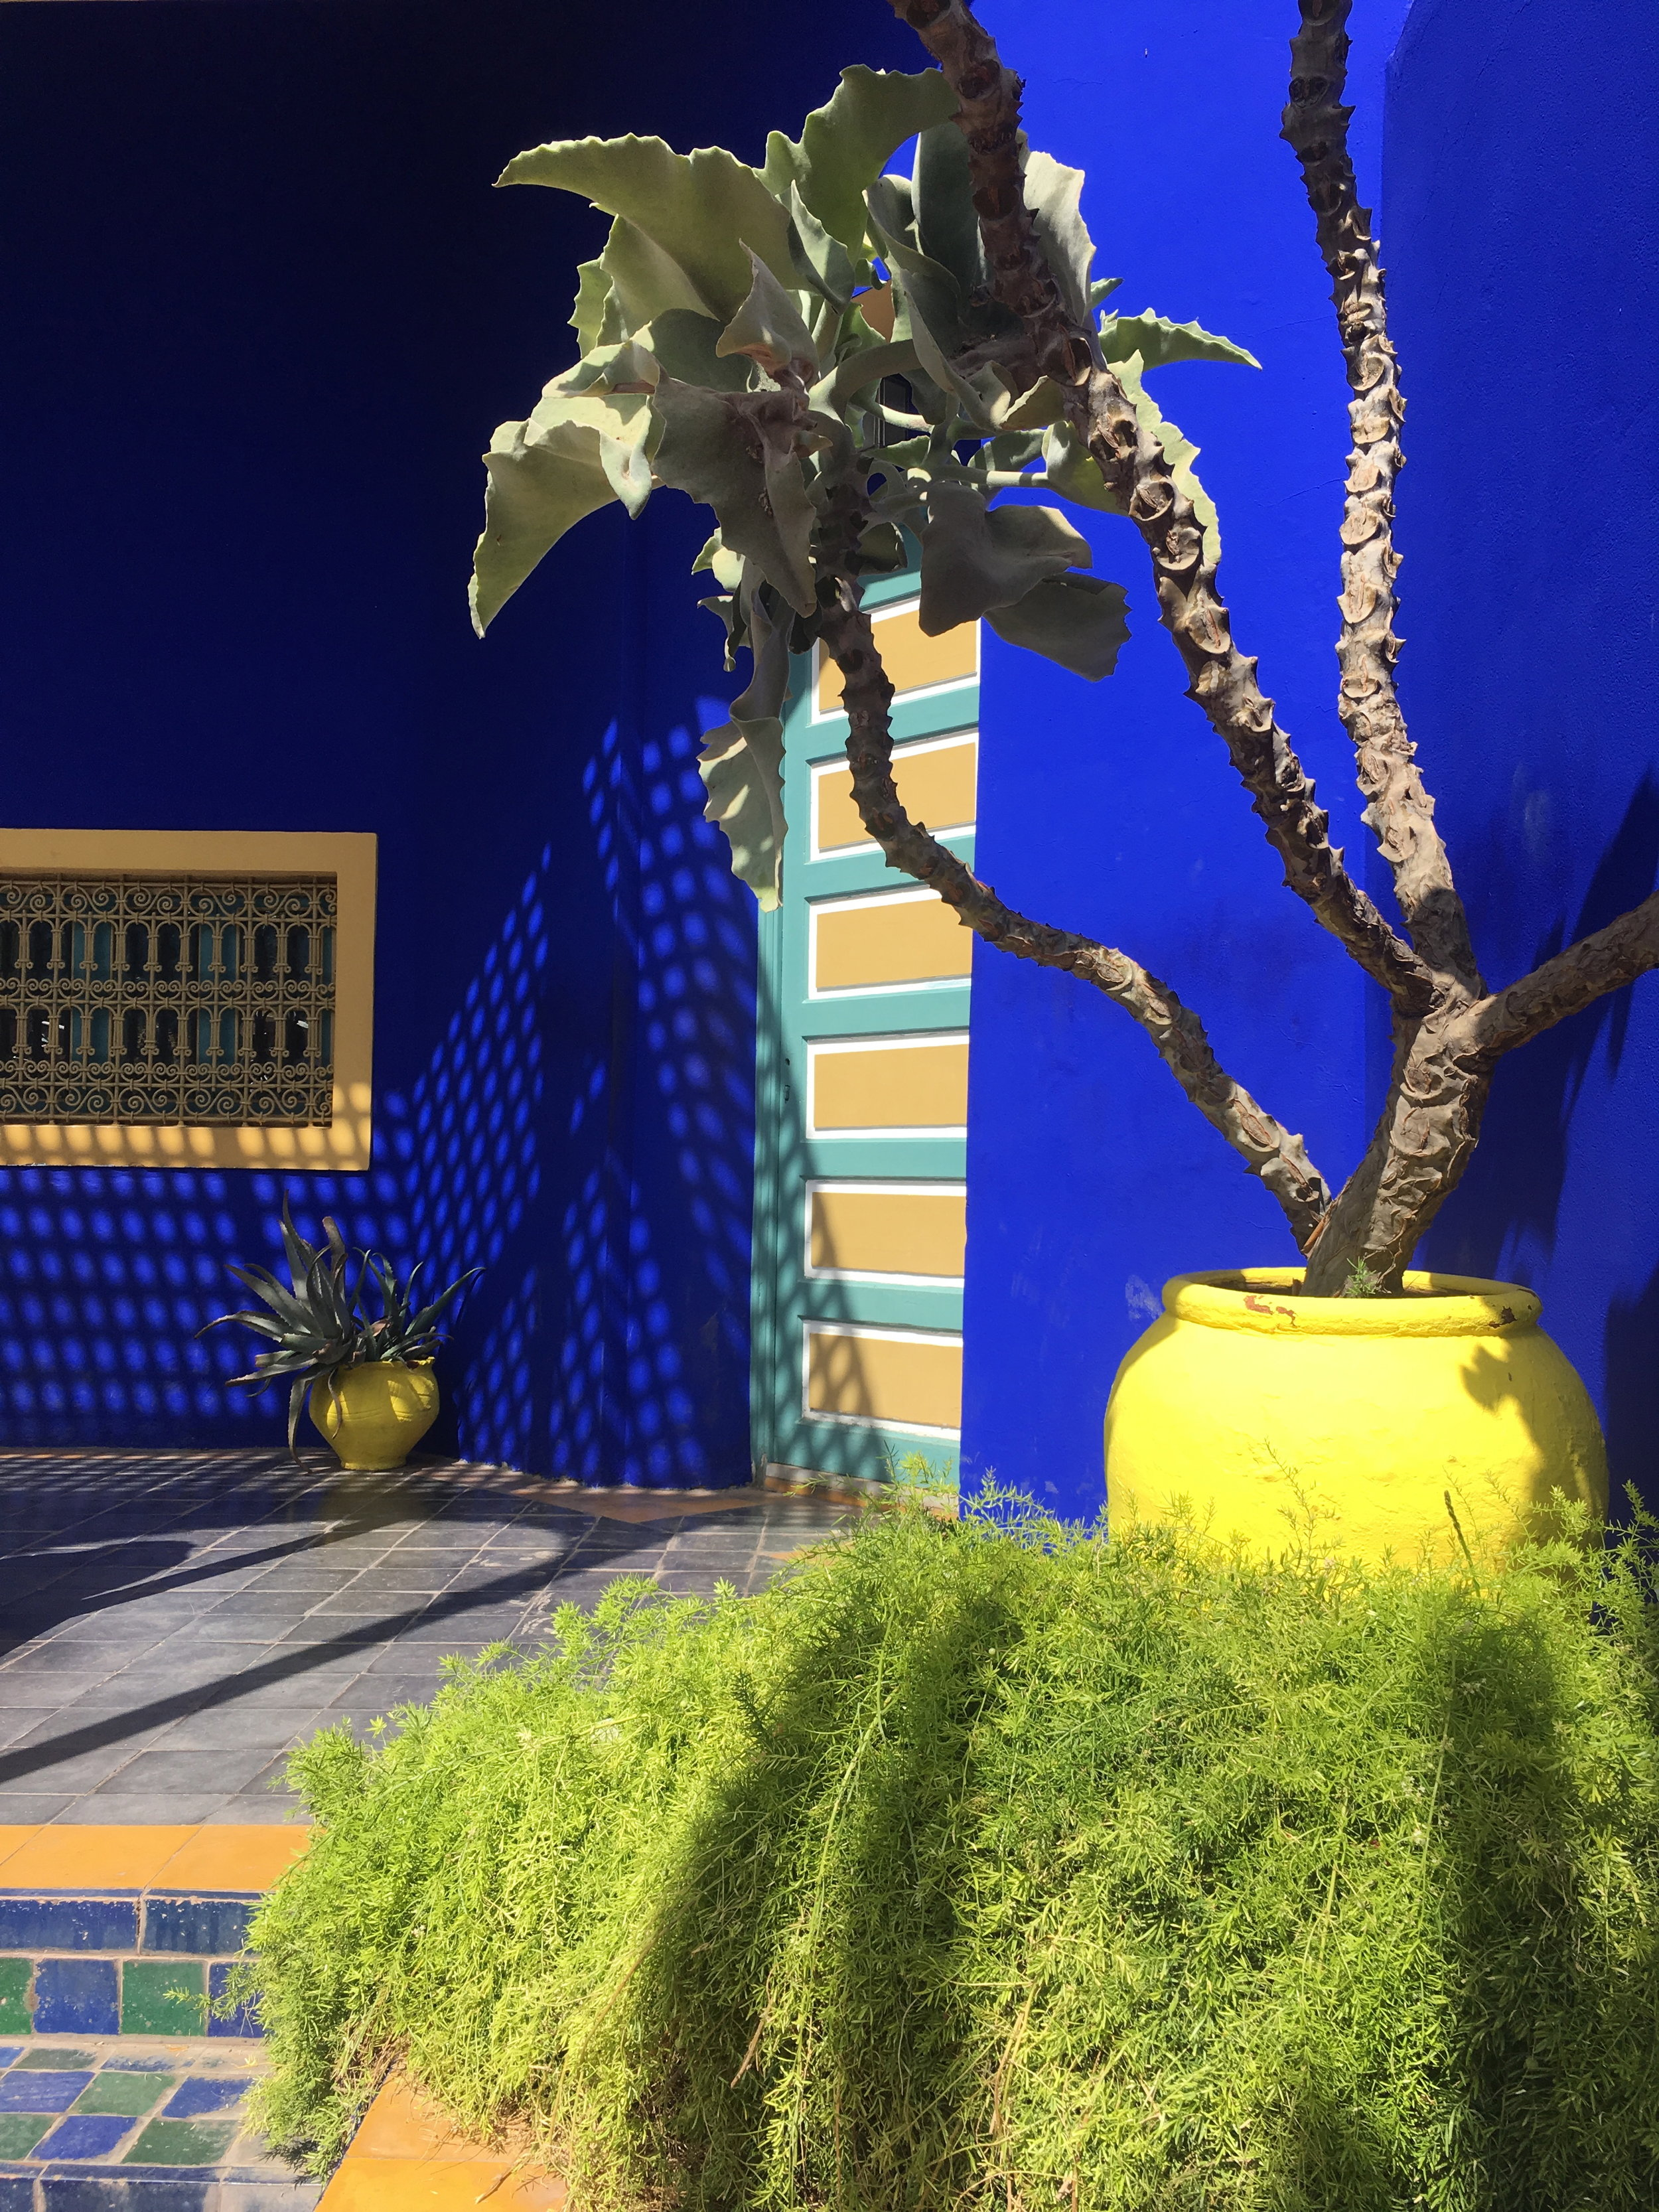 Yves Saint Laurent's home in Marrakech